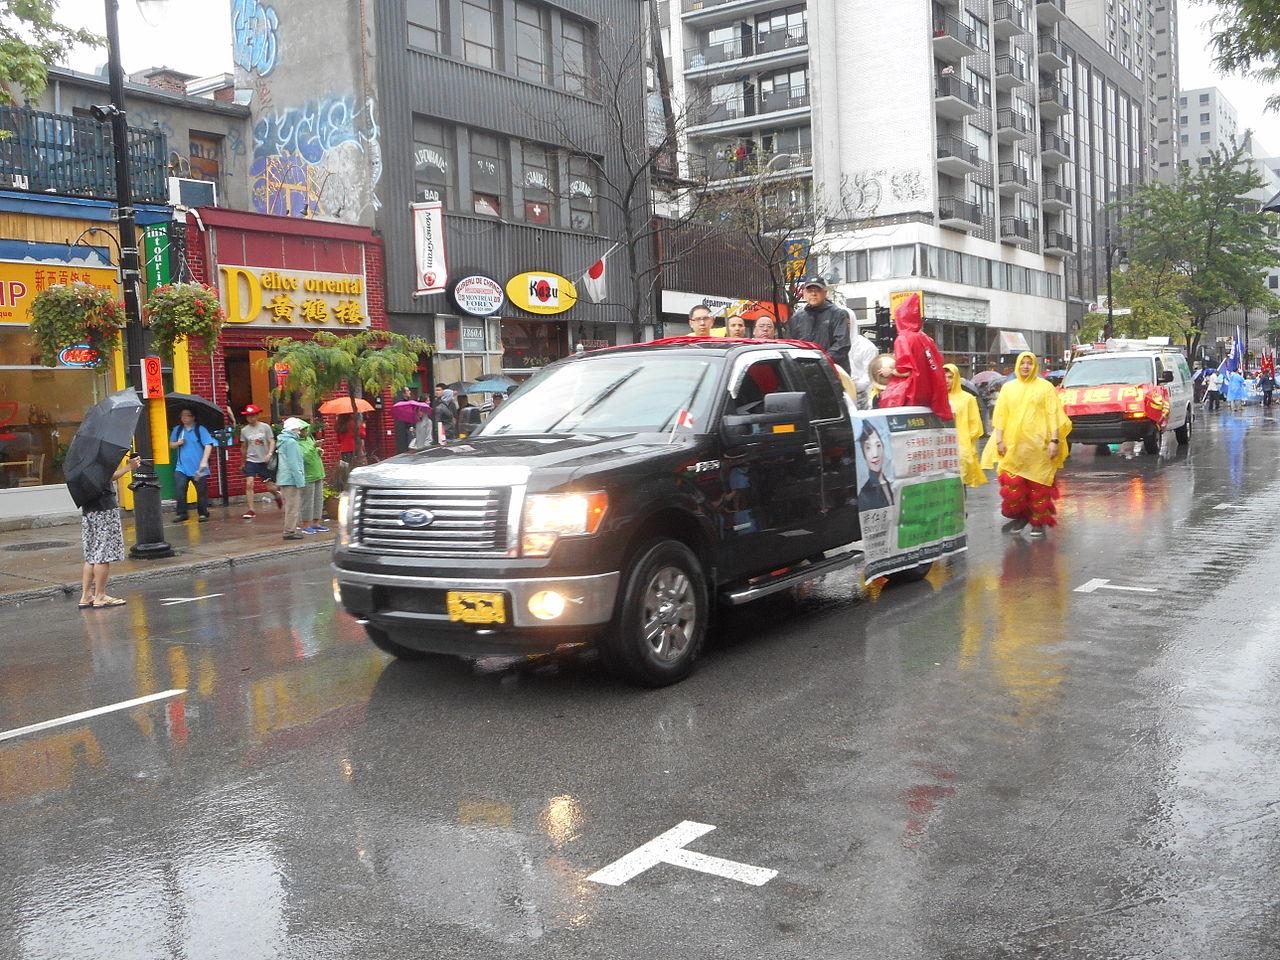 File:Canada Day 2015 on Saint Catherine Street - 313.jpg - Wikimedia